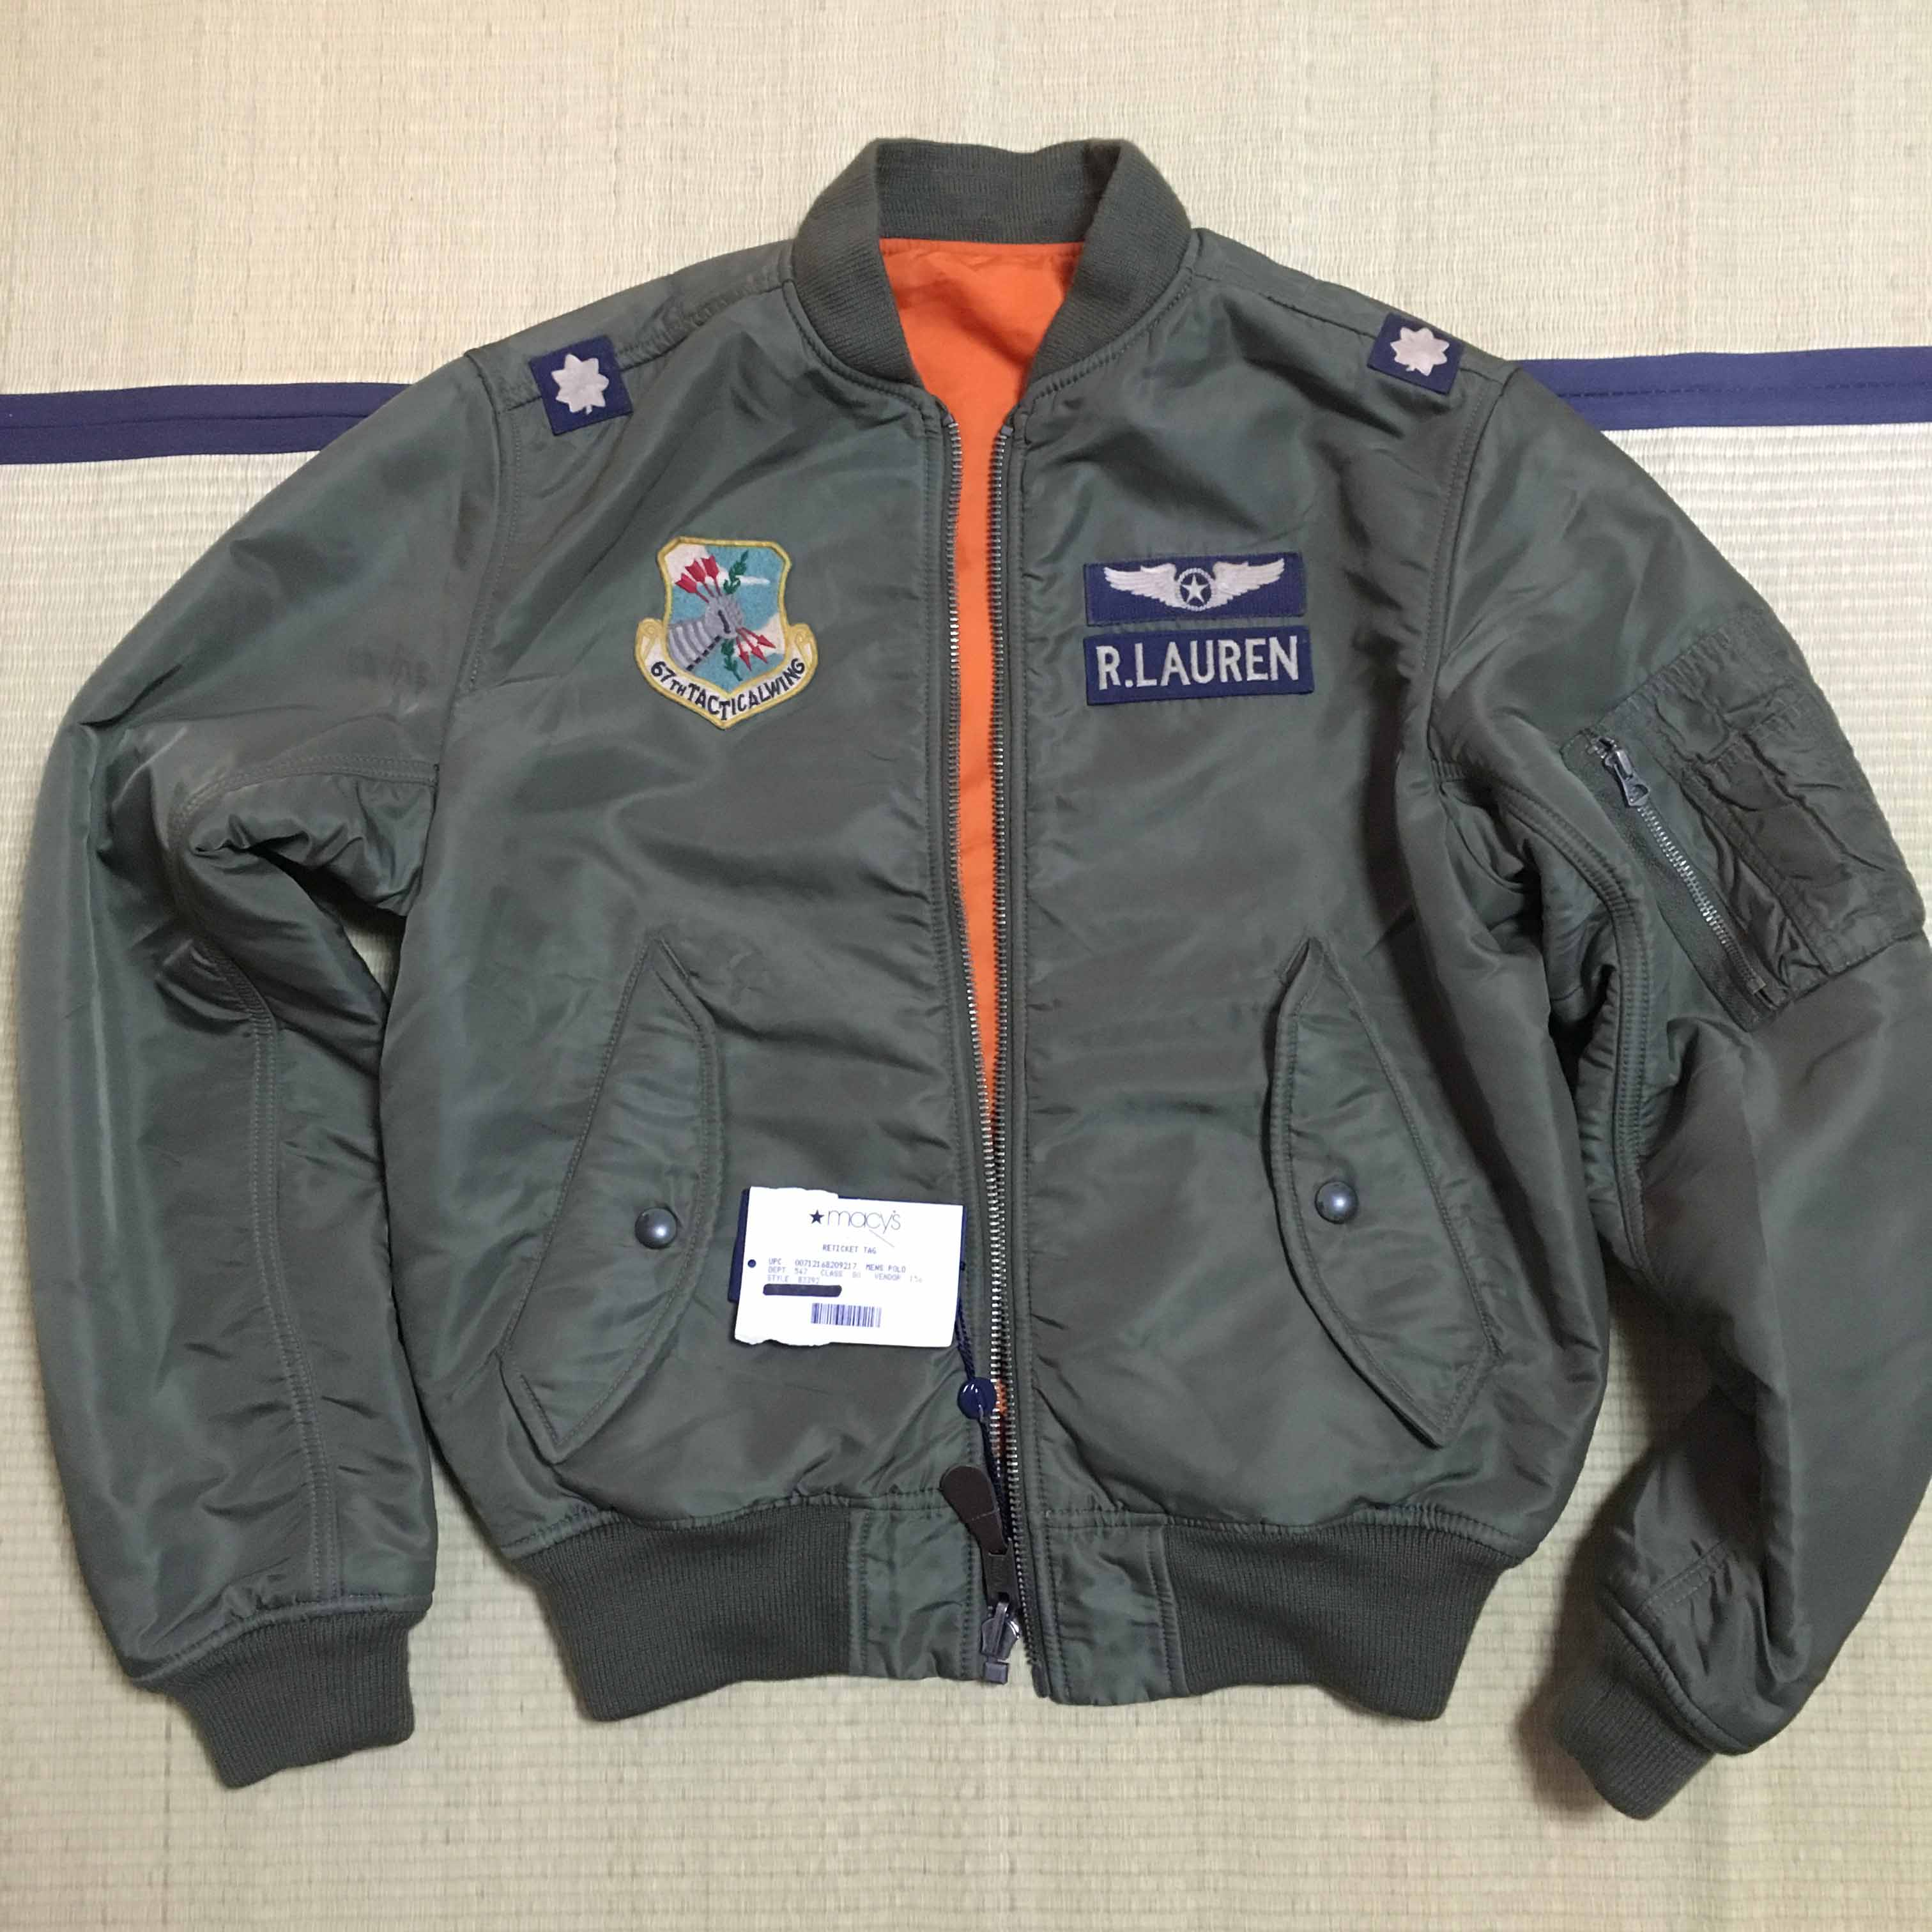 Polo Ralph Lauren 经典MA-1飞行员夹克